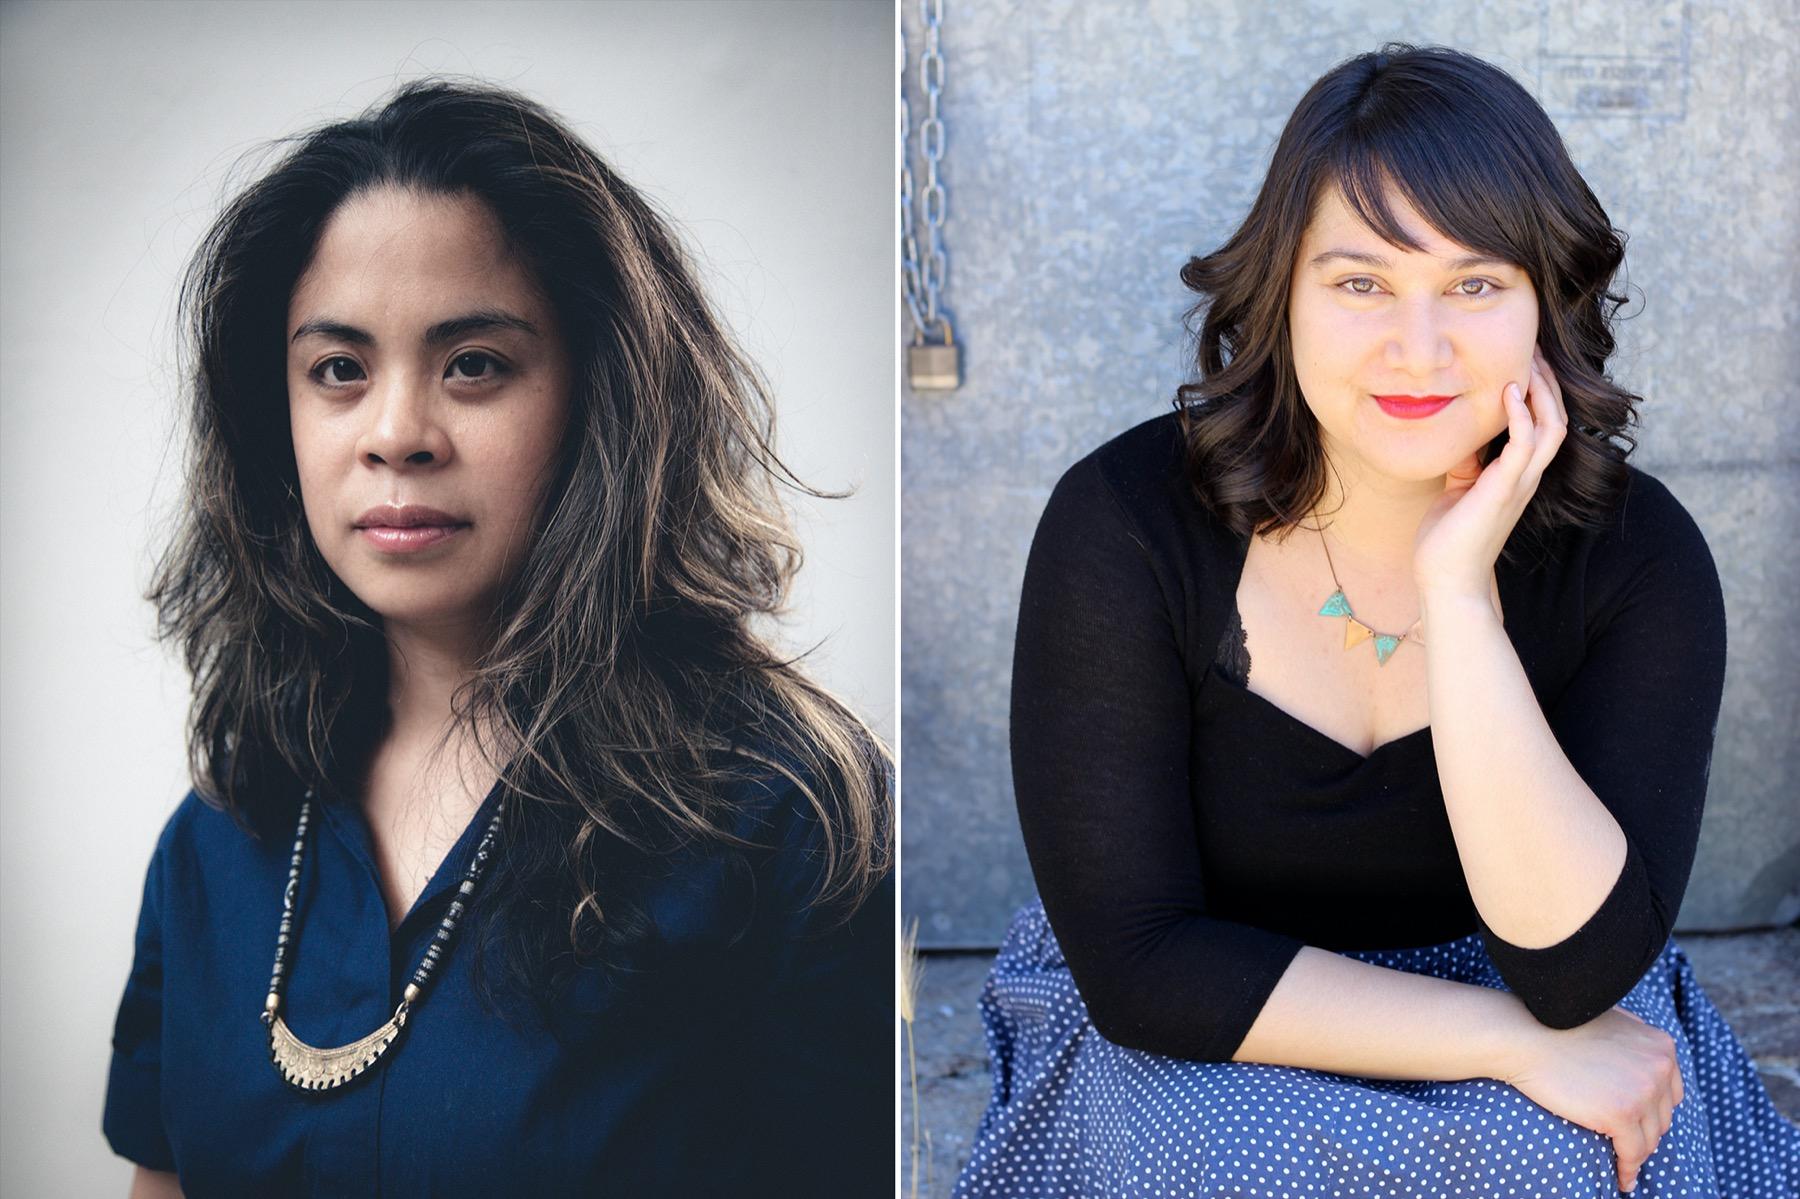 Chicago's Poetry off the Shelf: Sarah Gambito & Janine Joseph